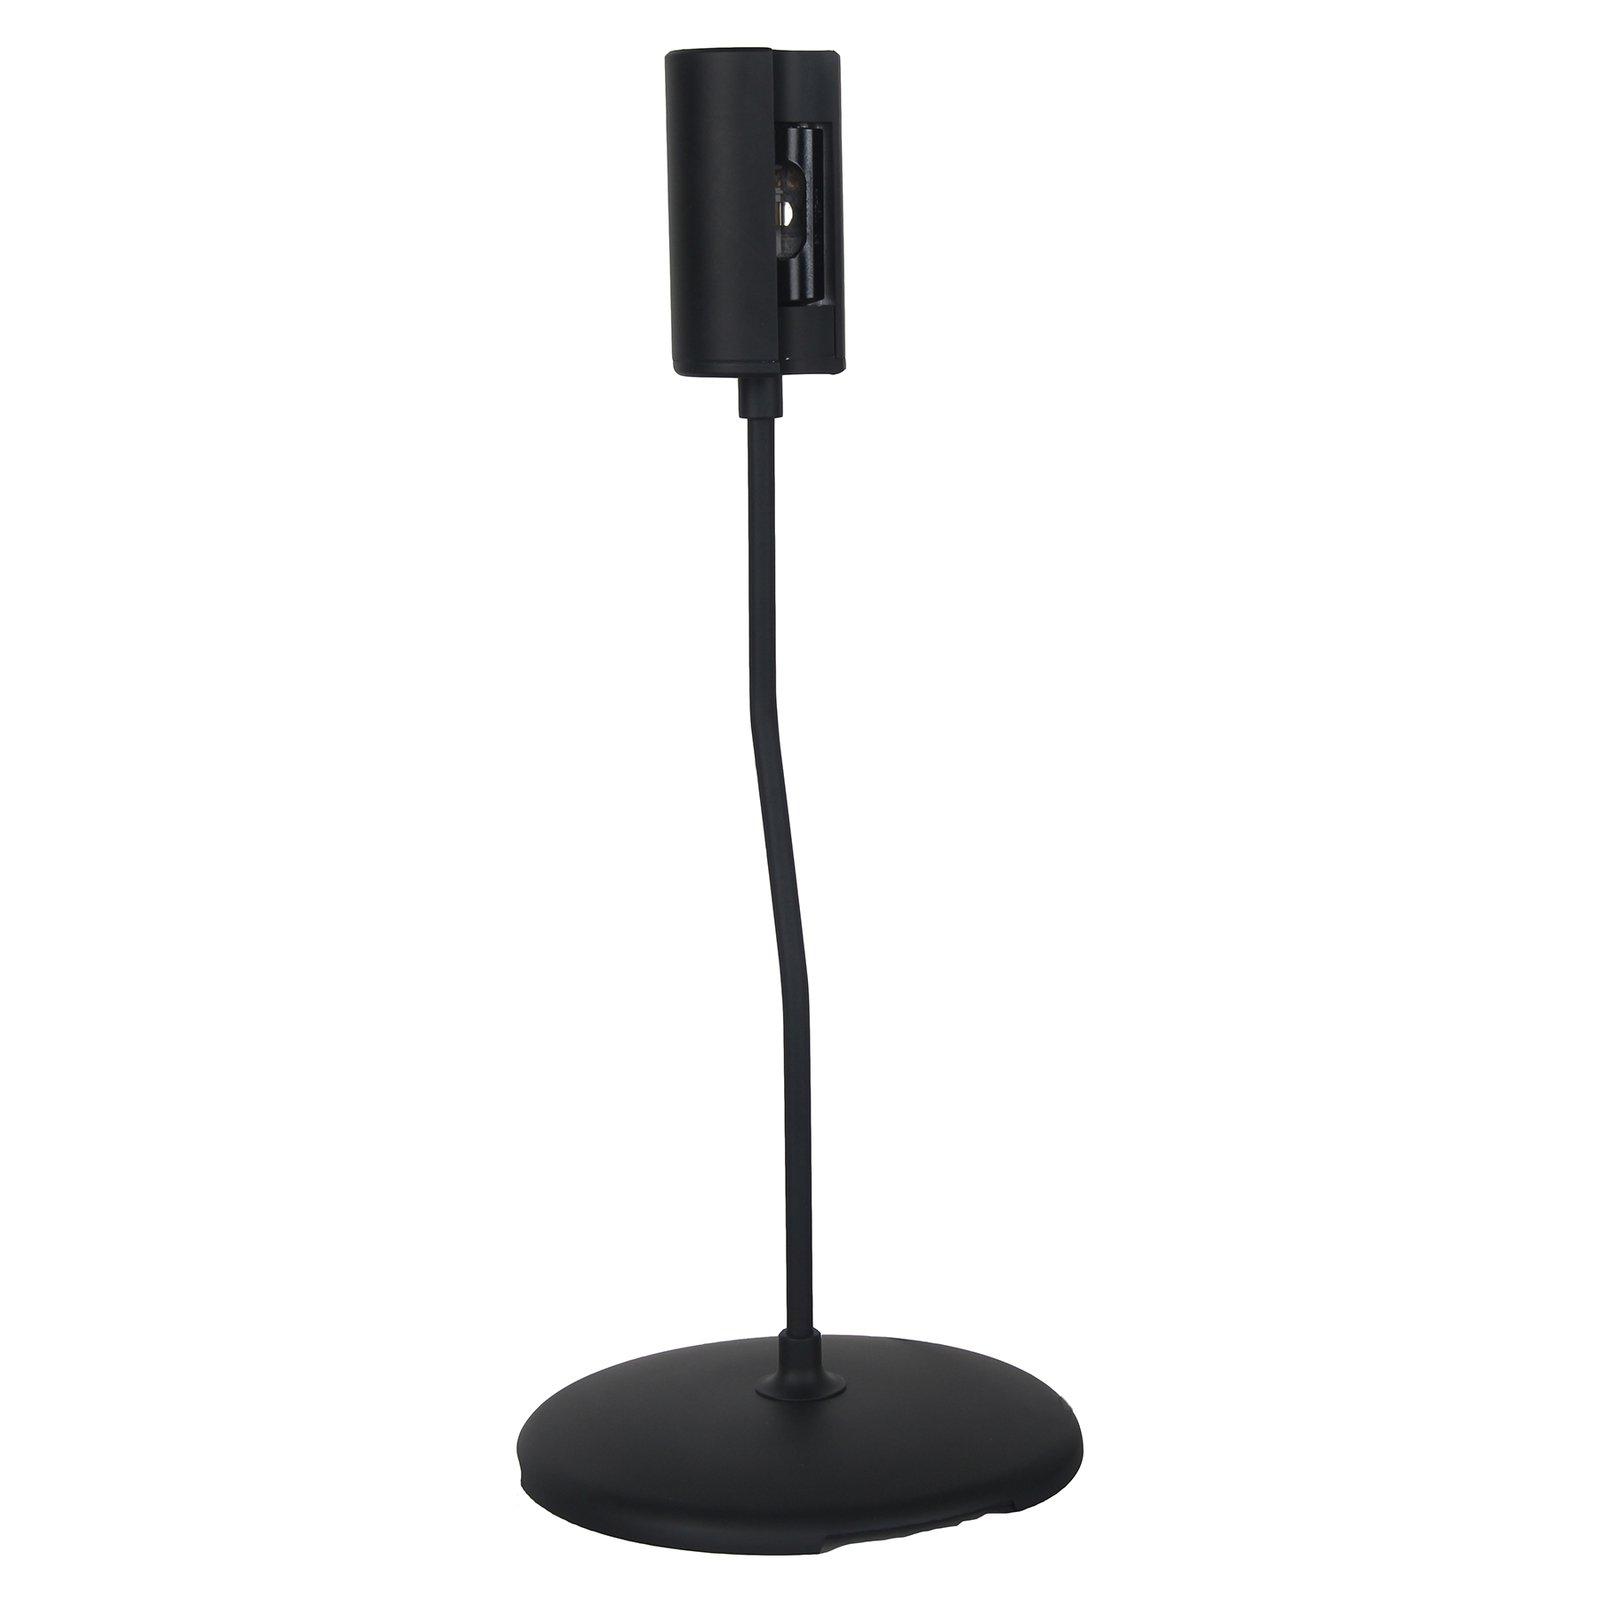 SEGULA Small Letta bordlampe i svart